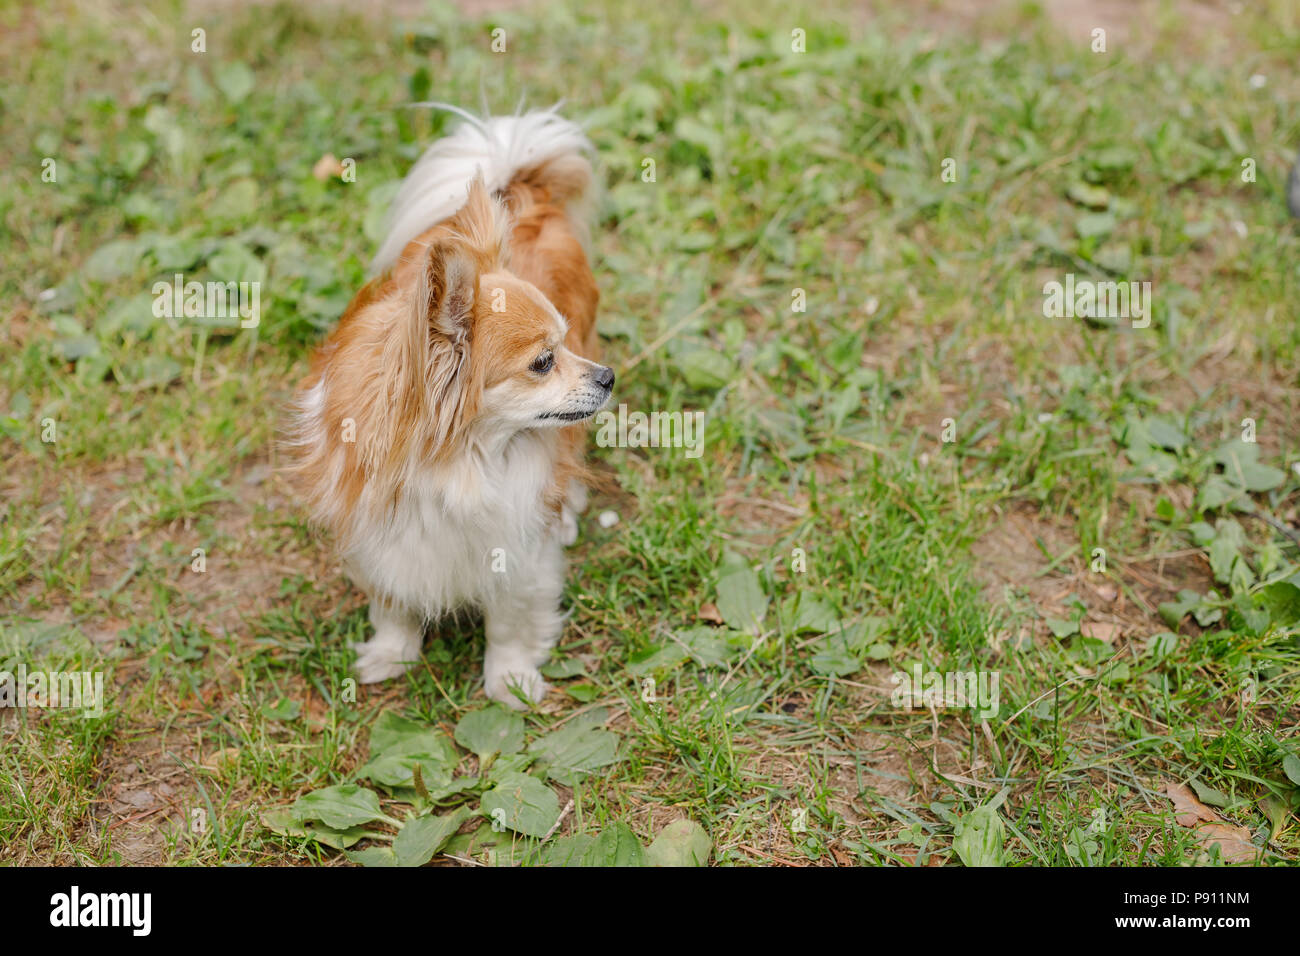 Zwei Langhaar Chihuahua Hund Im Grunen Gras Stockfotografie Alamy